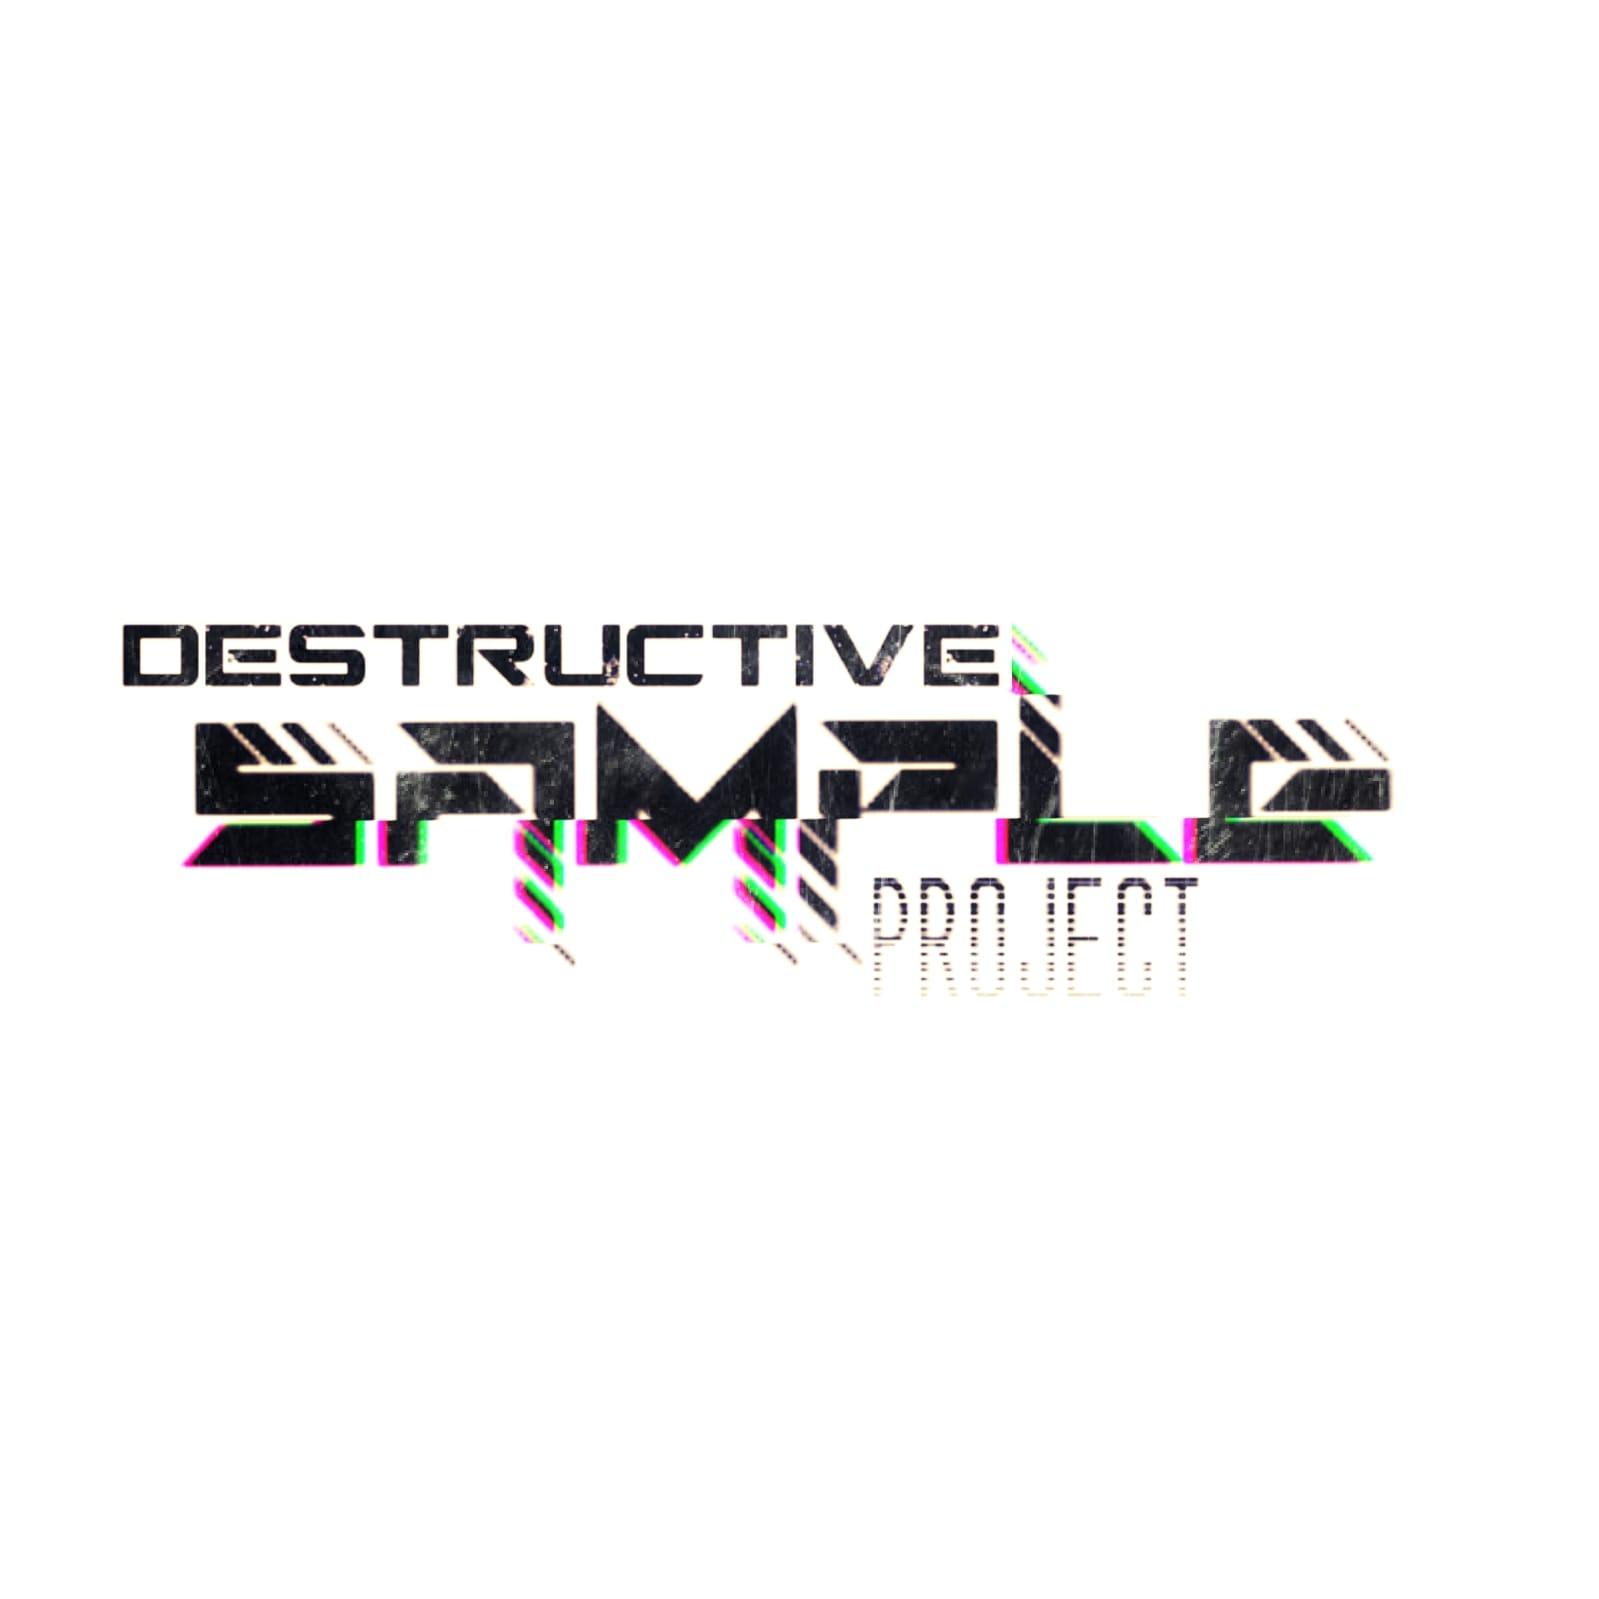 Destructive Sample Project